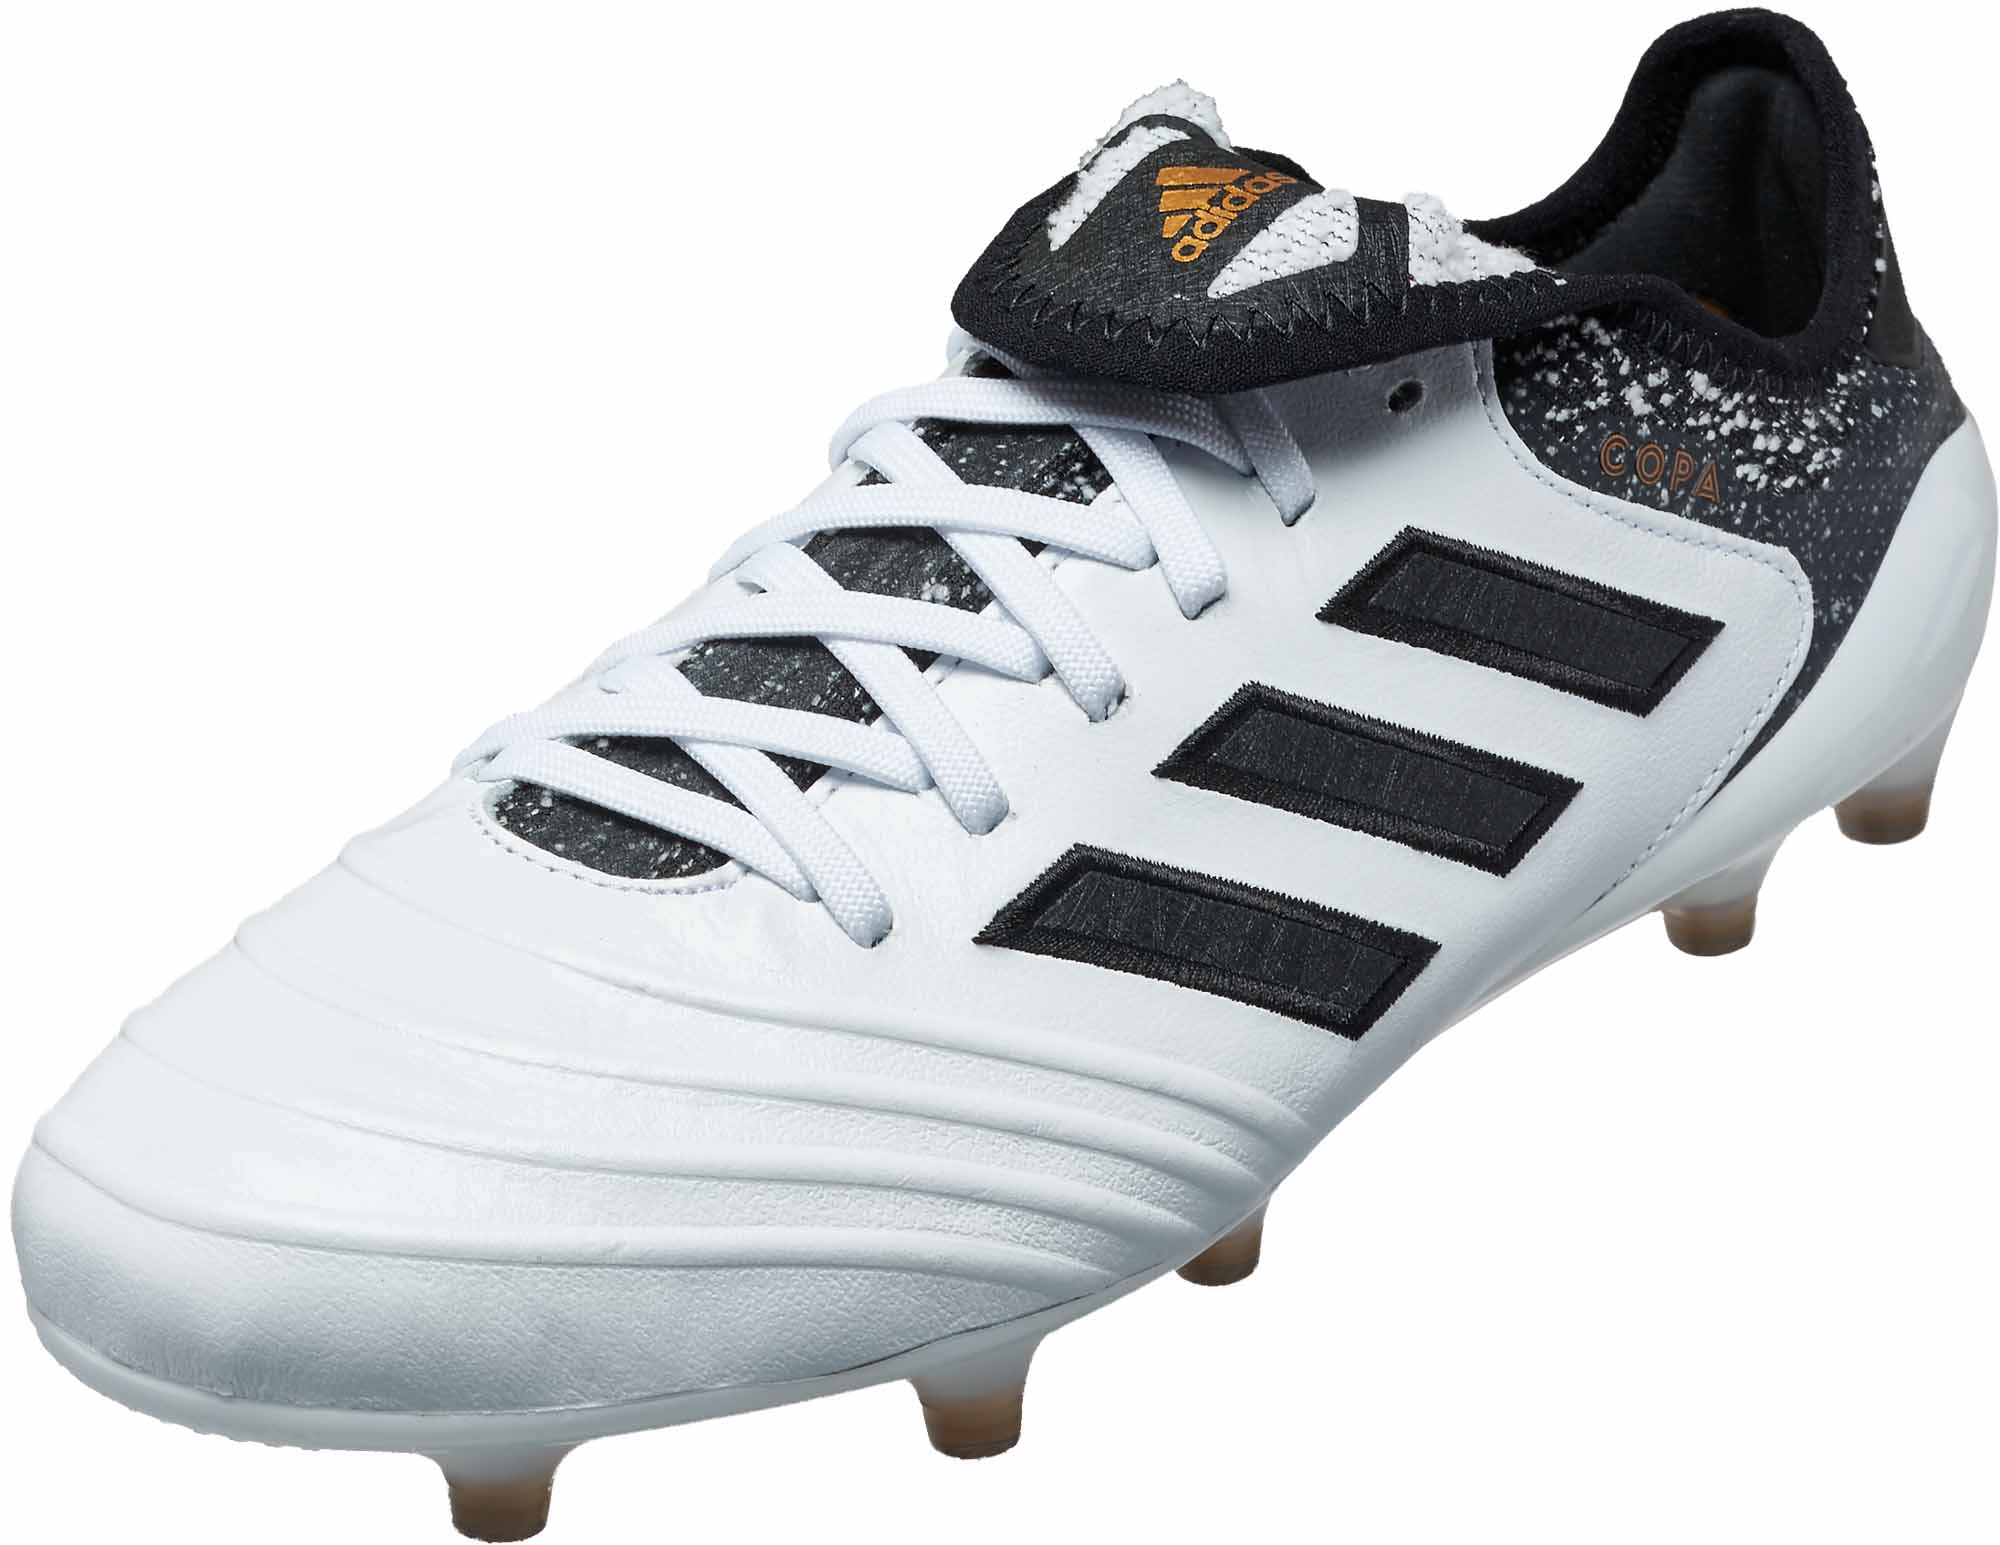 6a0bc8addc3 adidas Copa 18.1 FG - White   Tactile Gold Metallic - Soccer Master